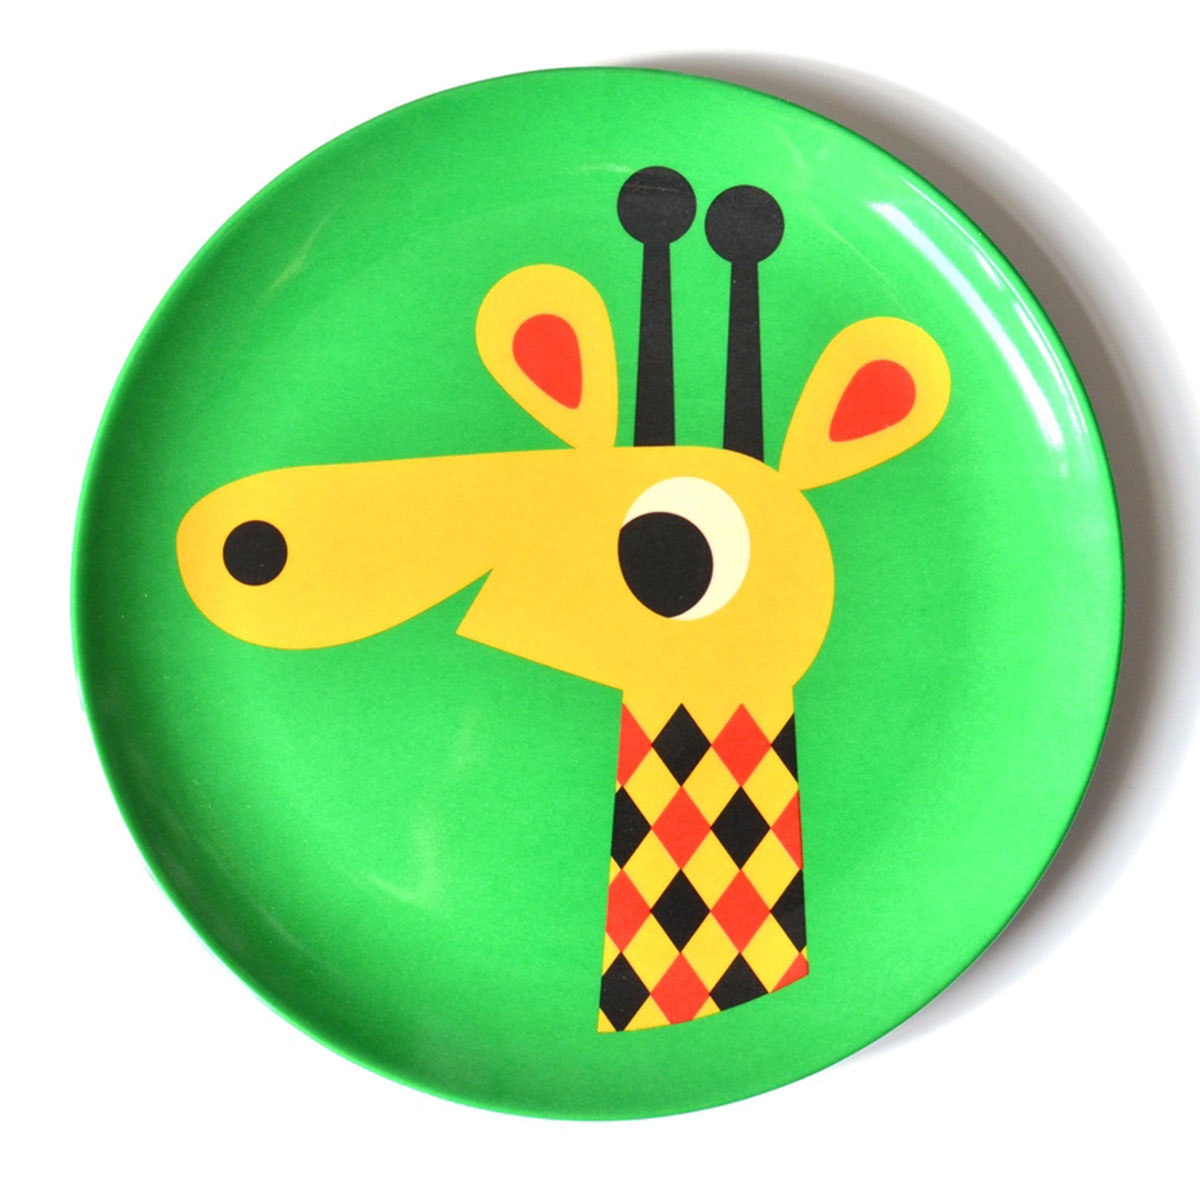 Vaisselle & Couvert Assiette Girafe par Ingela P. Arrhenius Assiette Girafe par Ingela P. Arrhenius